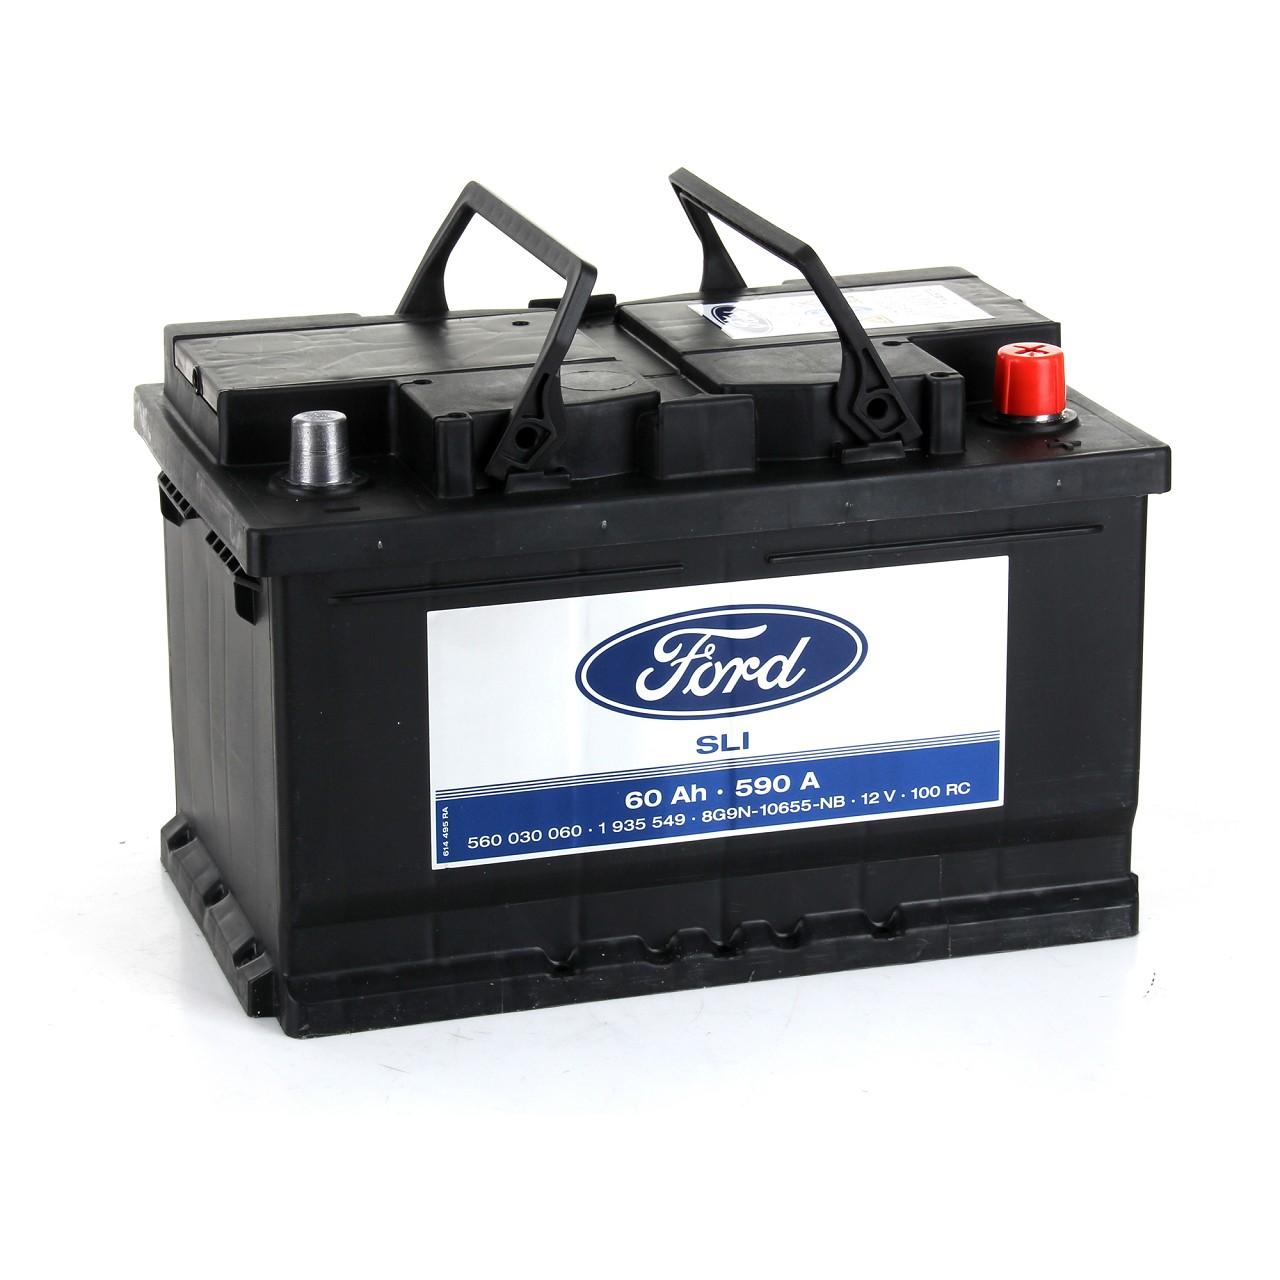 ORIGINAL Ford Autobatterie Batterie Starterbatterie 12V 60Ah 590A 1935549